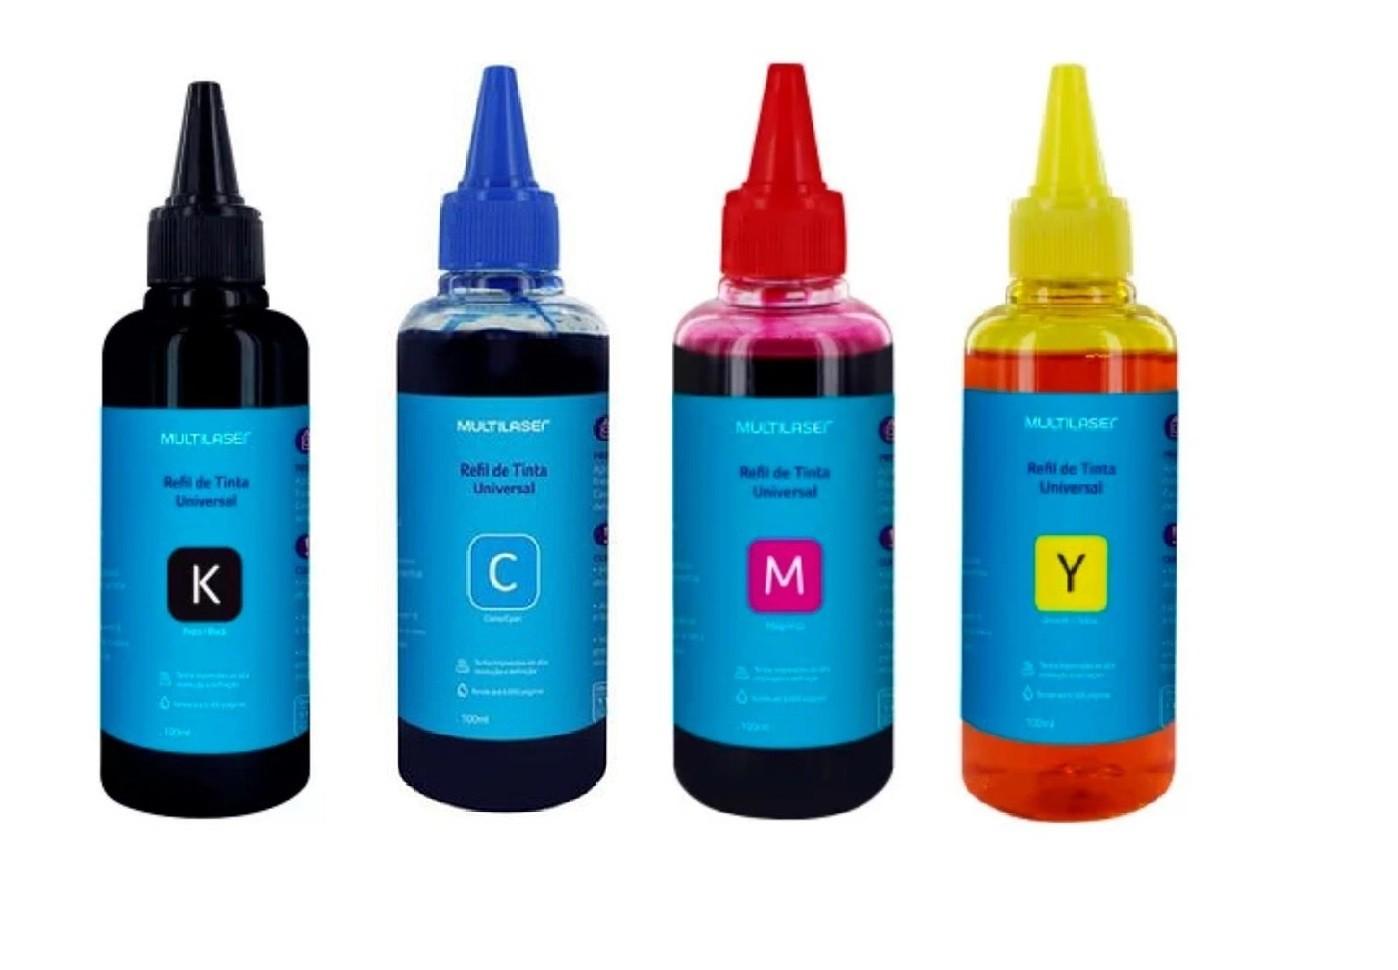 Kit Refil De Tinta Multilaser Preto amarelo ciano e magenta para impressora Epson  - Mix Eletro